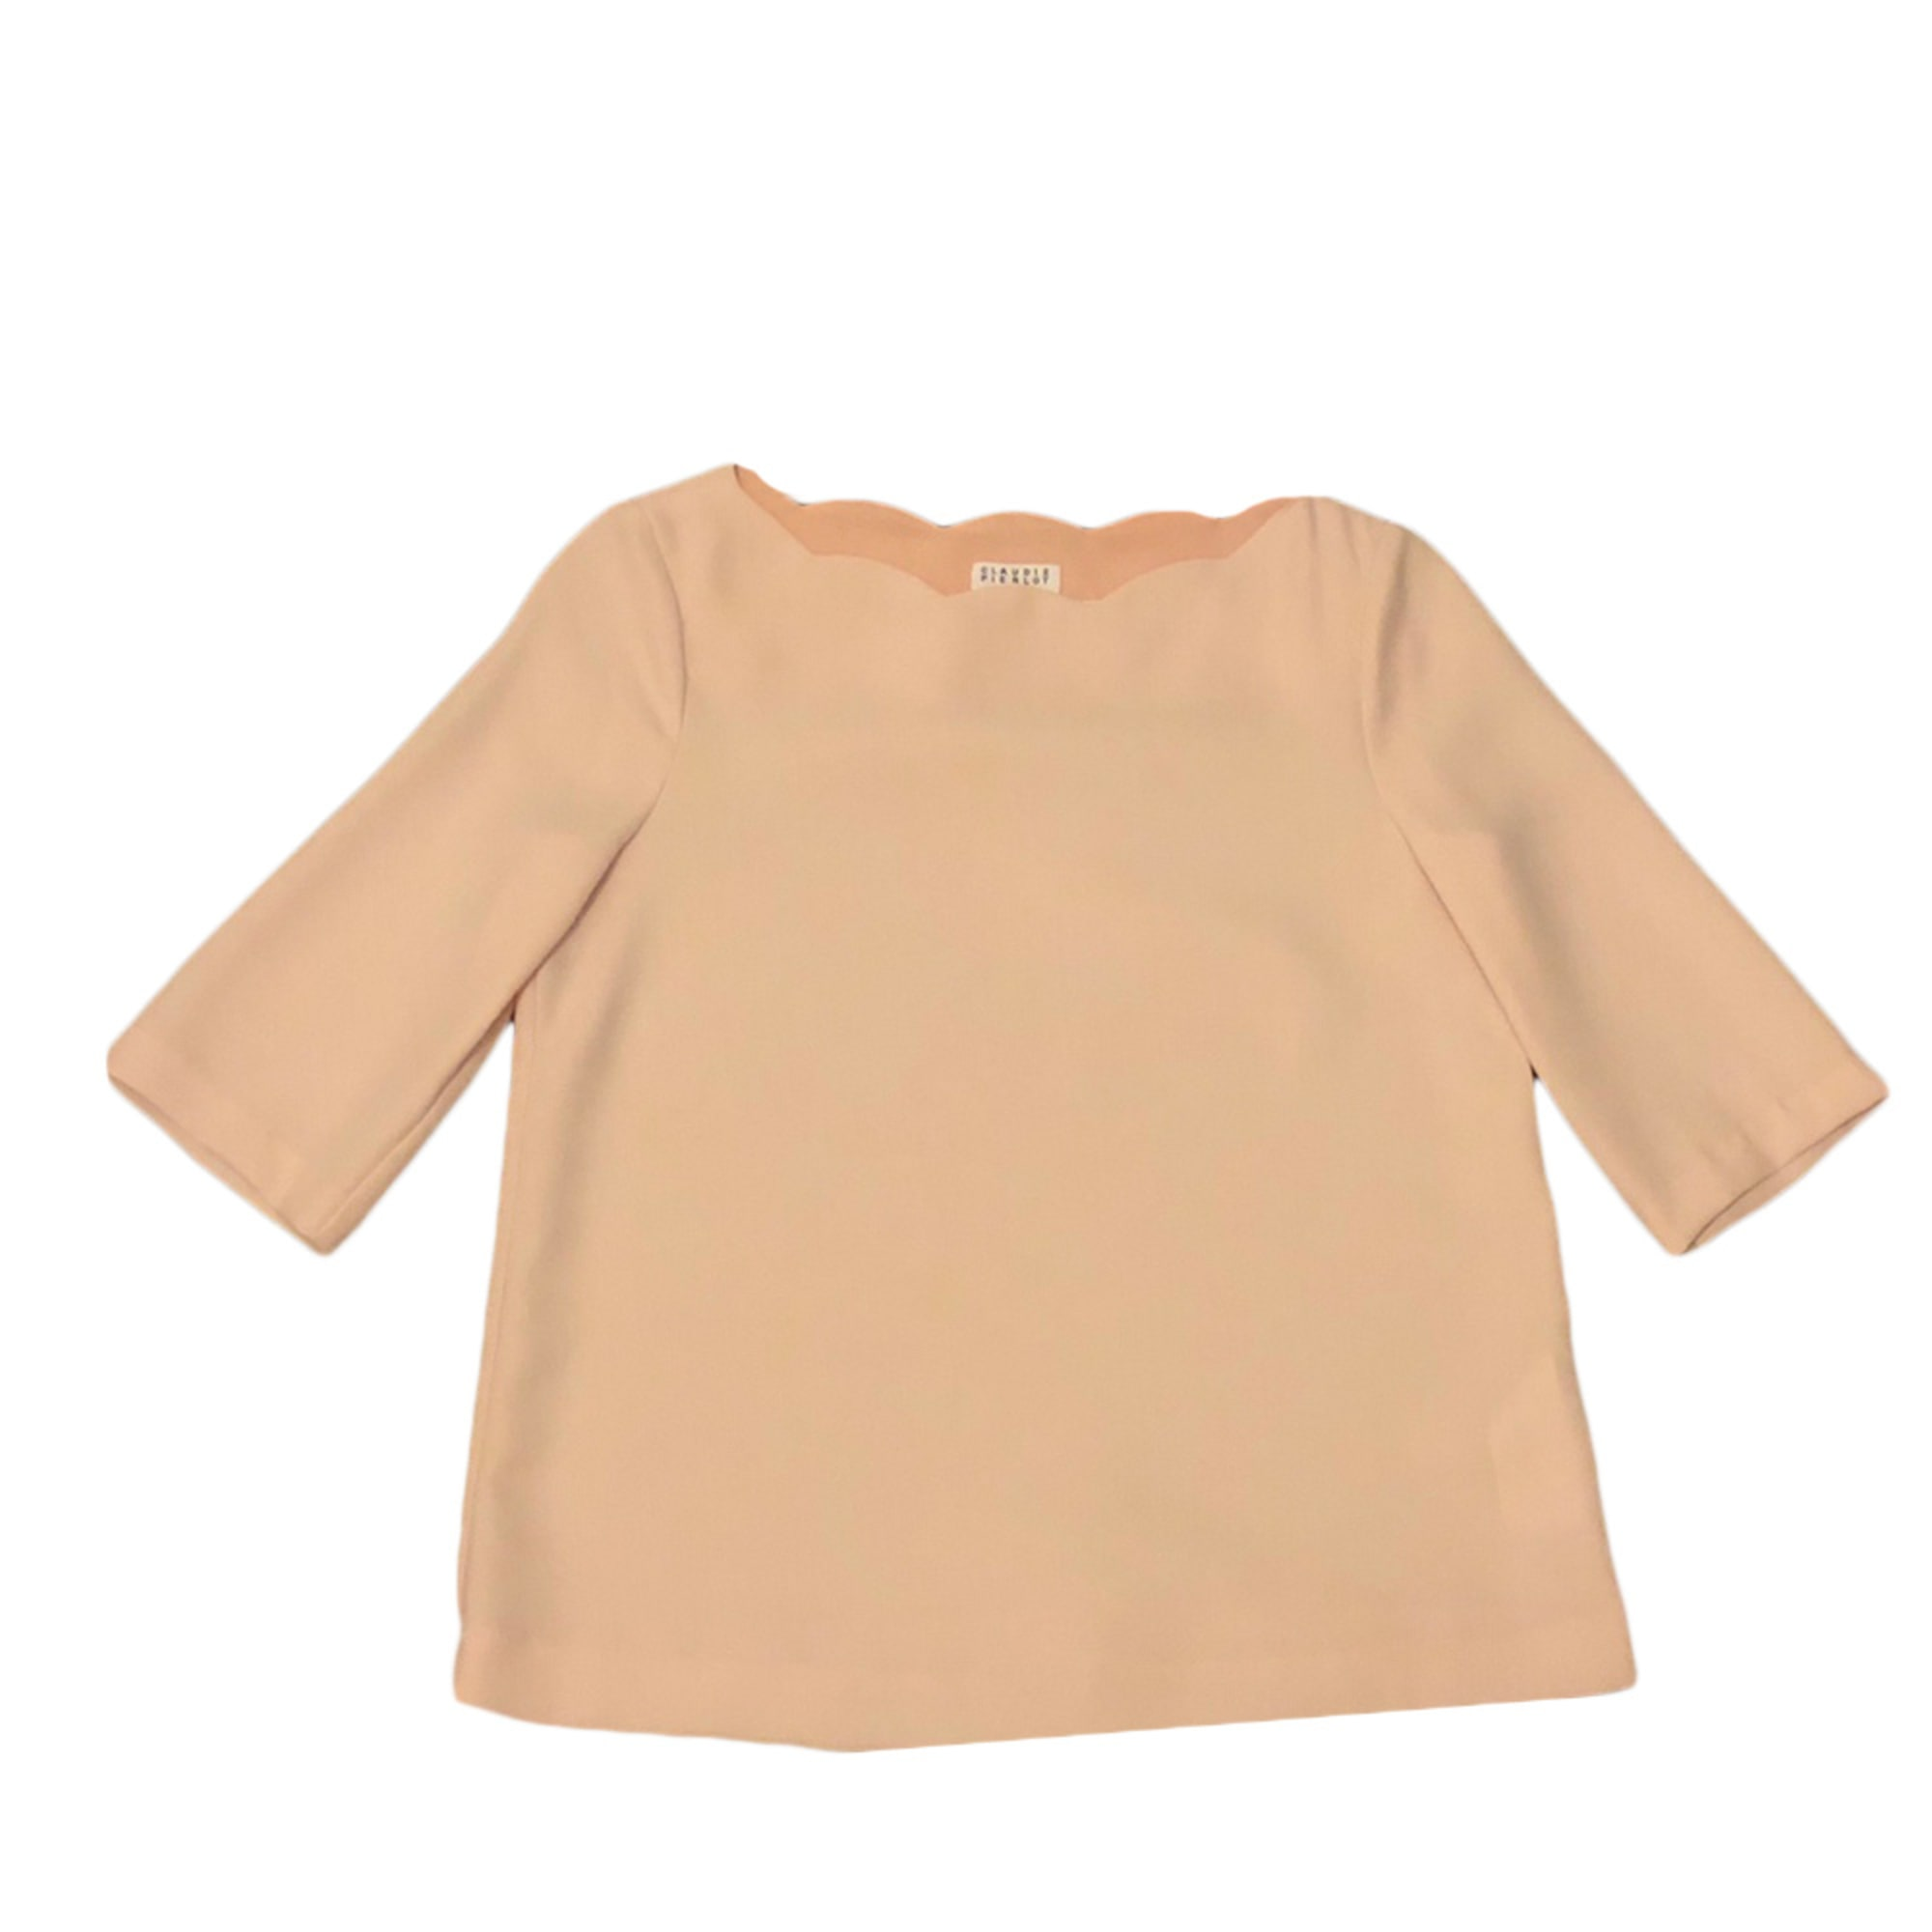 Blouse CLAUDIE PIERLOT Pink, fuchsia, light pink